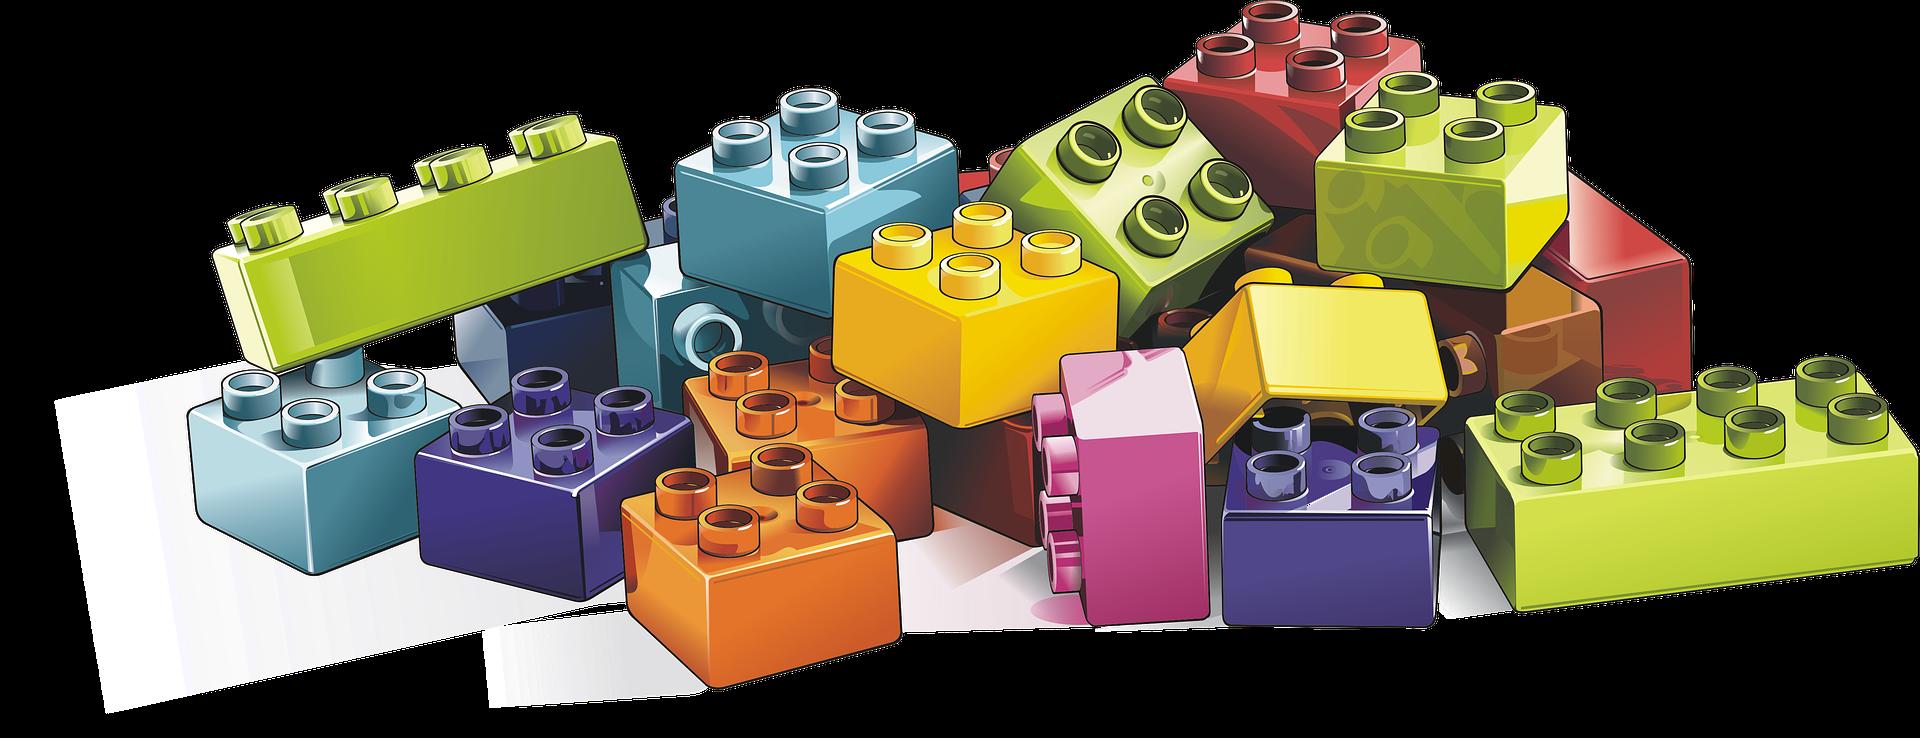 Shop puslespil og LEGO legetøj hos Legebyen.dk